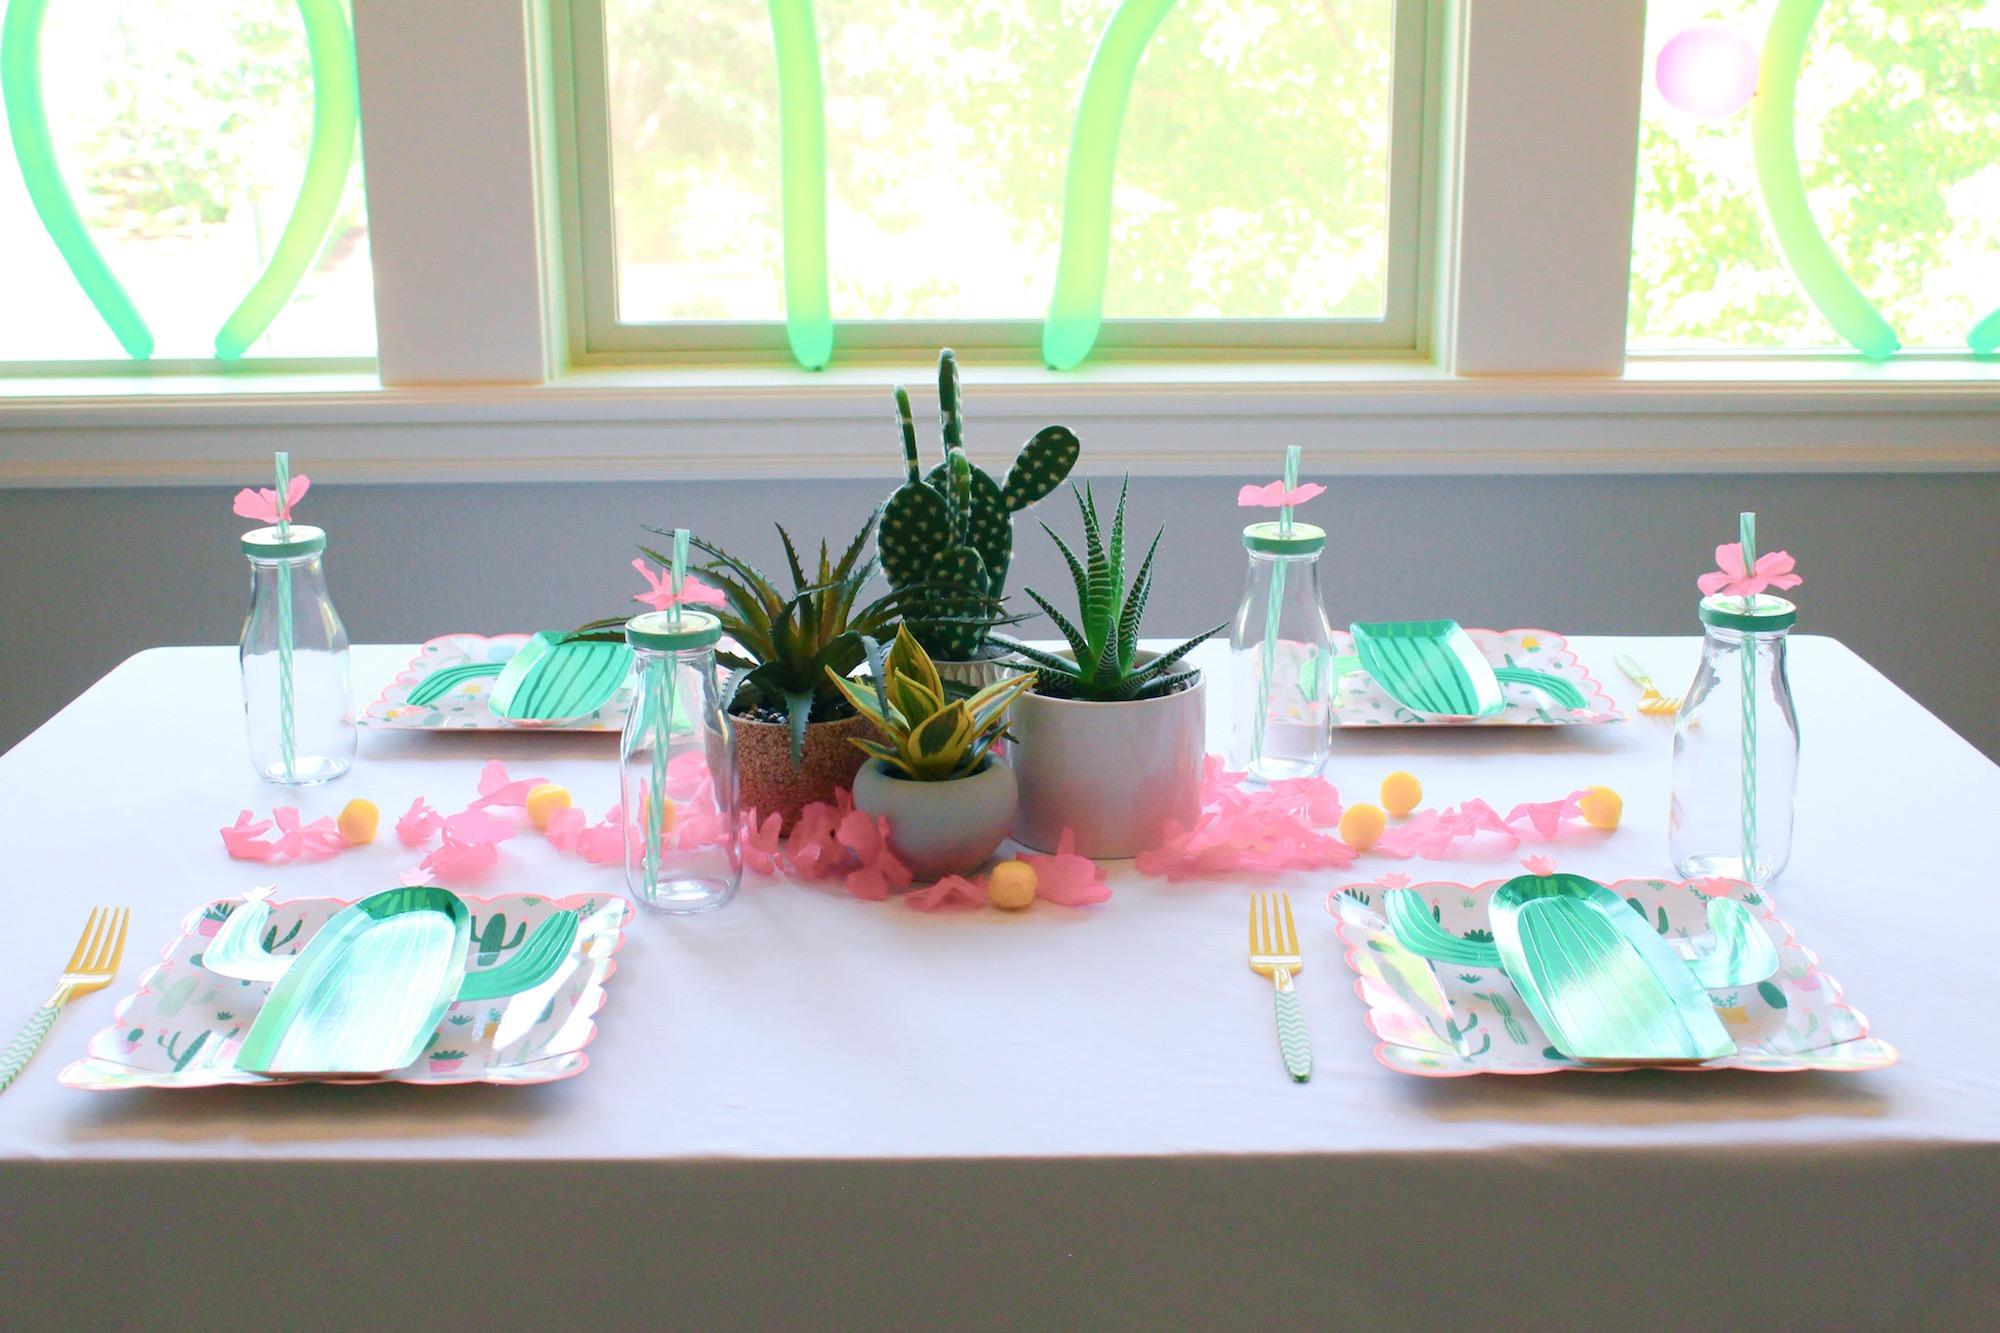 Cactus Table Setting Decor_Design Organize Party.JPG